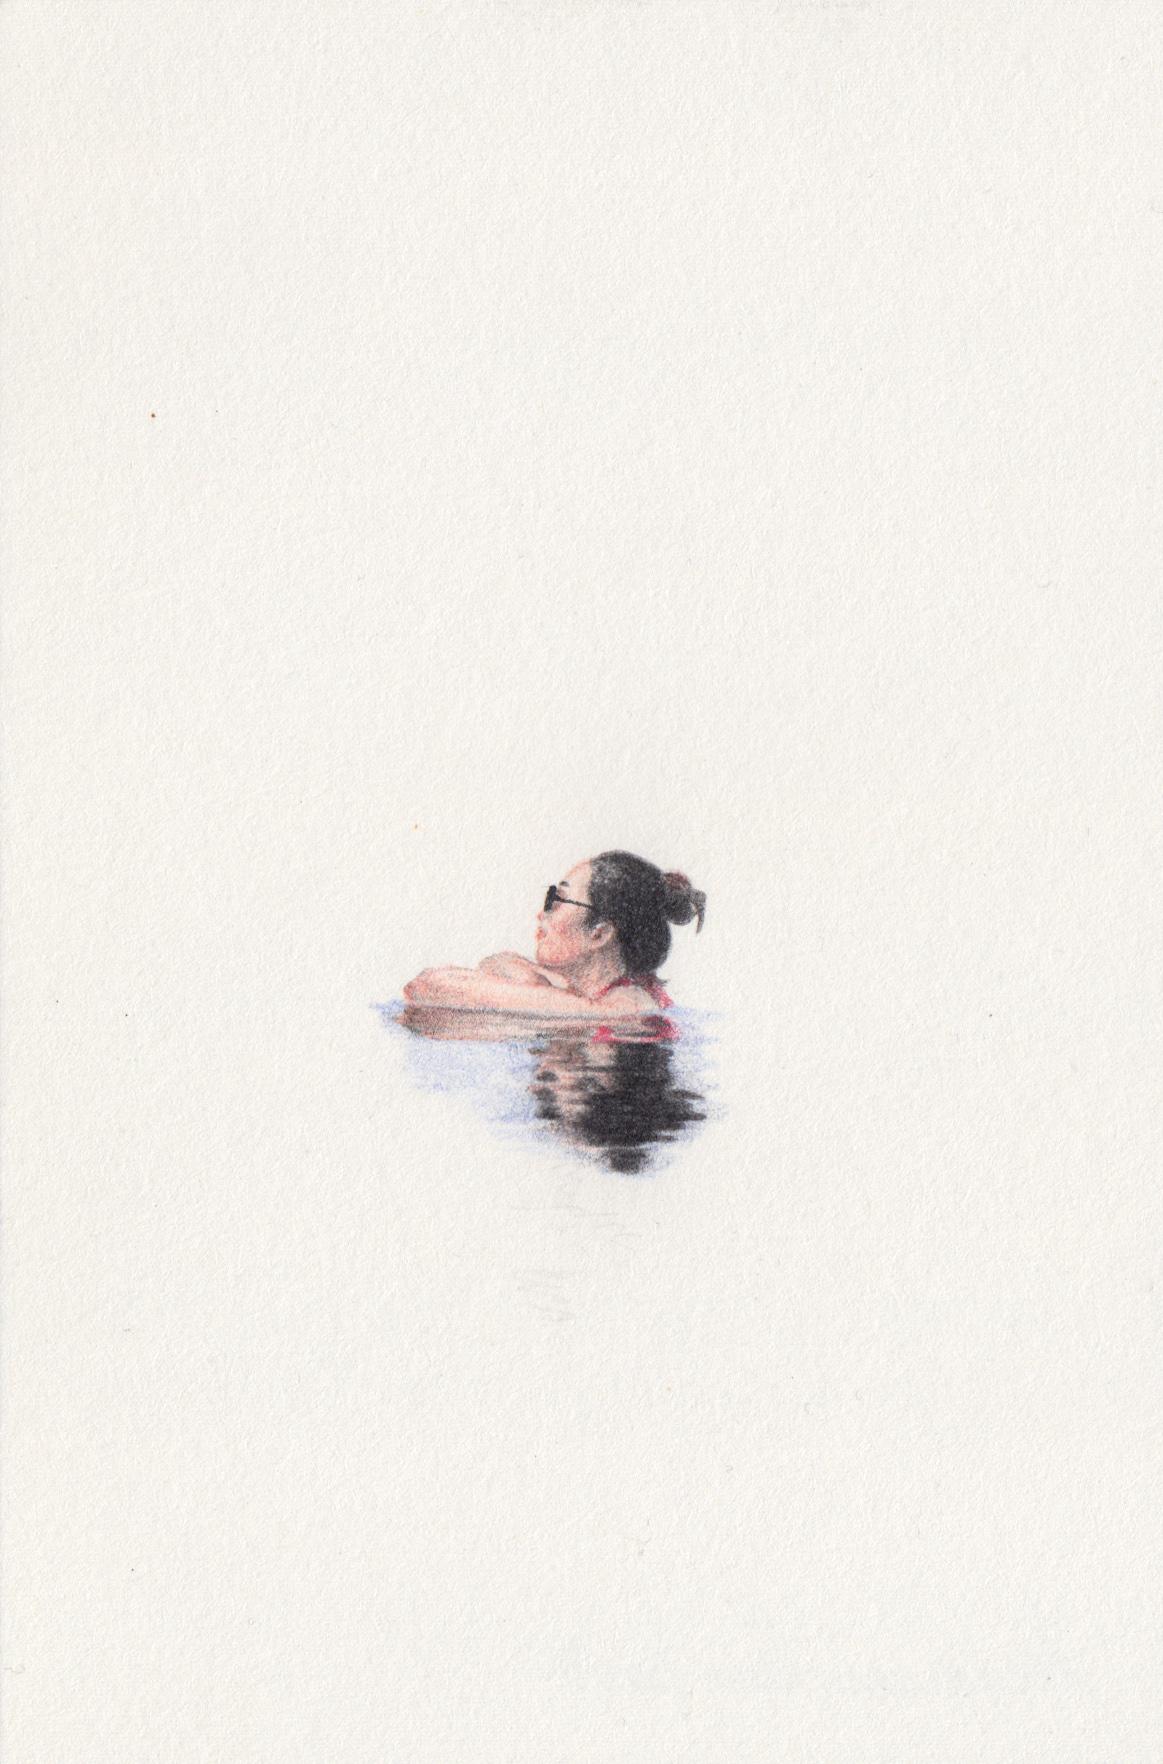 Loveblood Creative- Alexandre Luu -Hengyu (My Summer on Tinder).jpg